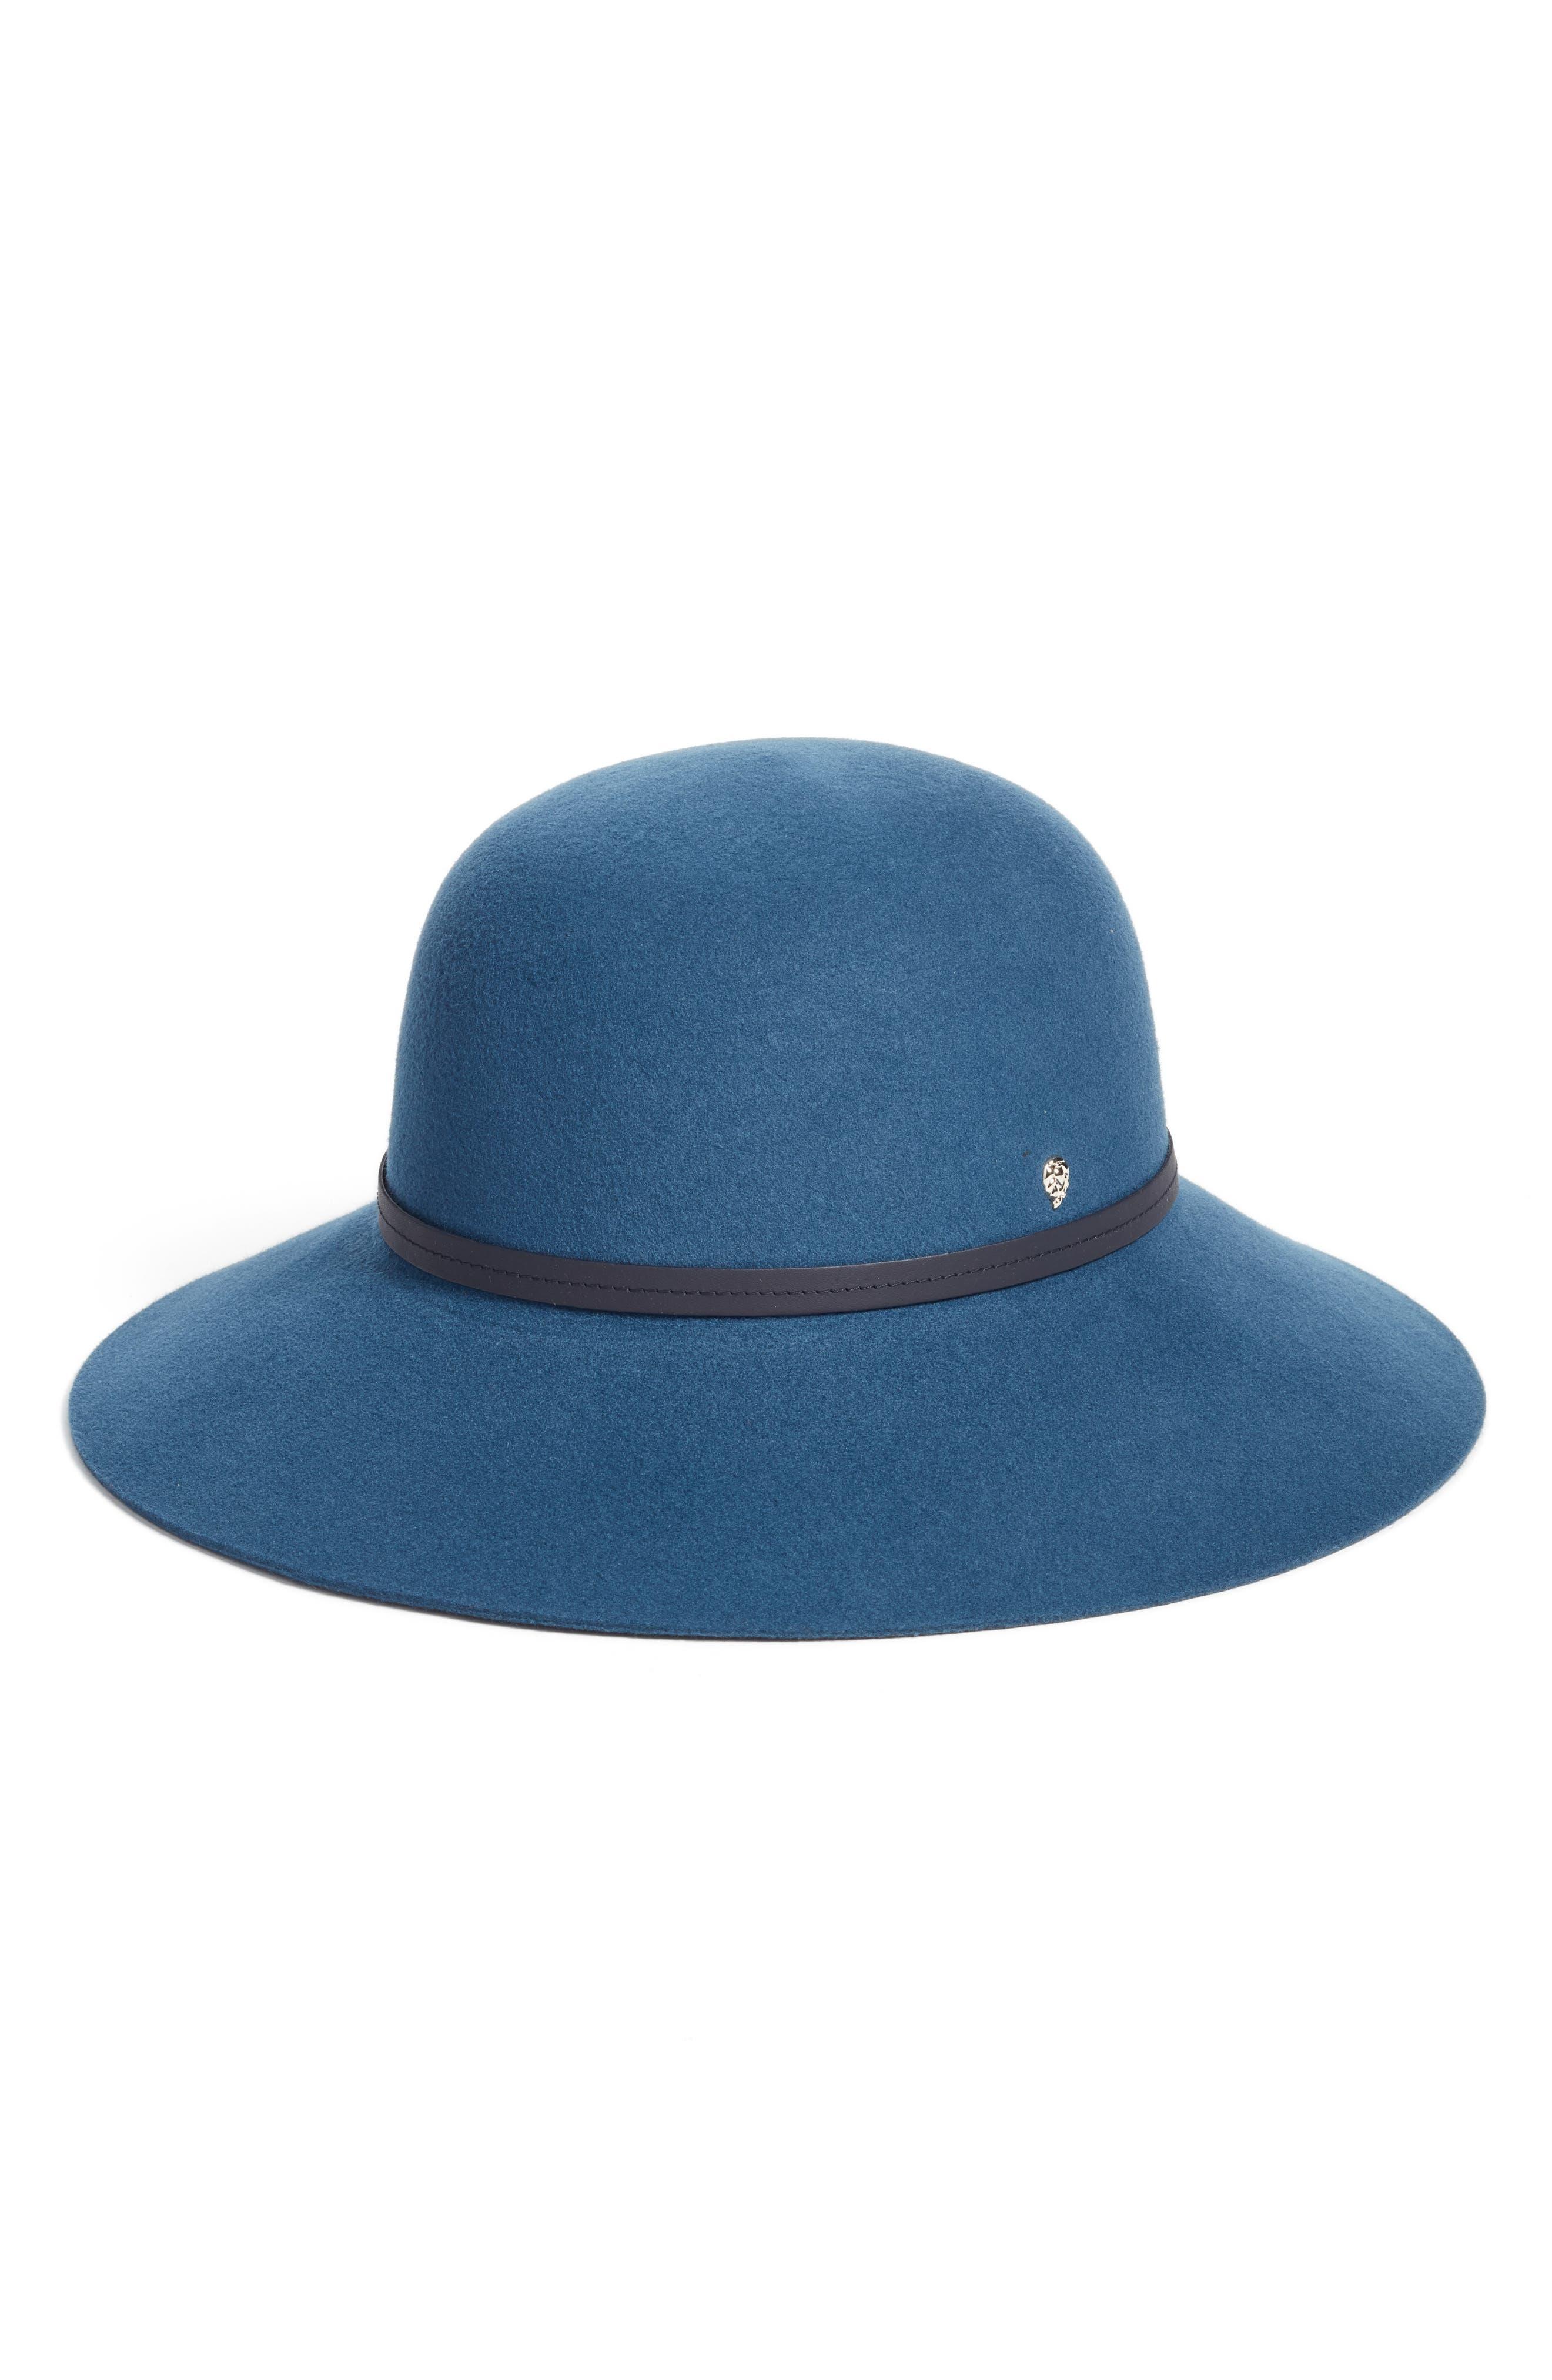 Angled Brim Wool Felt Hat,                         Main,                         color, Smoke Blue/ Navy